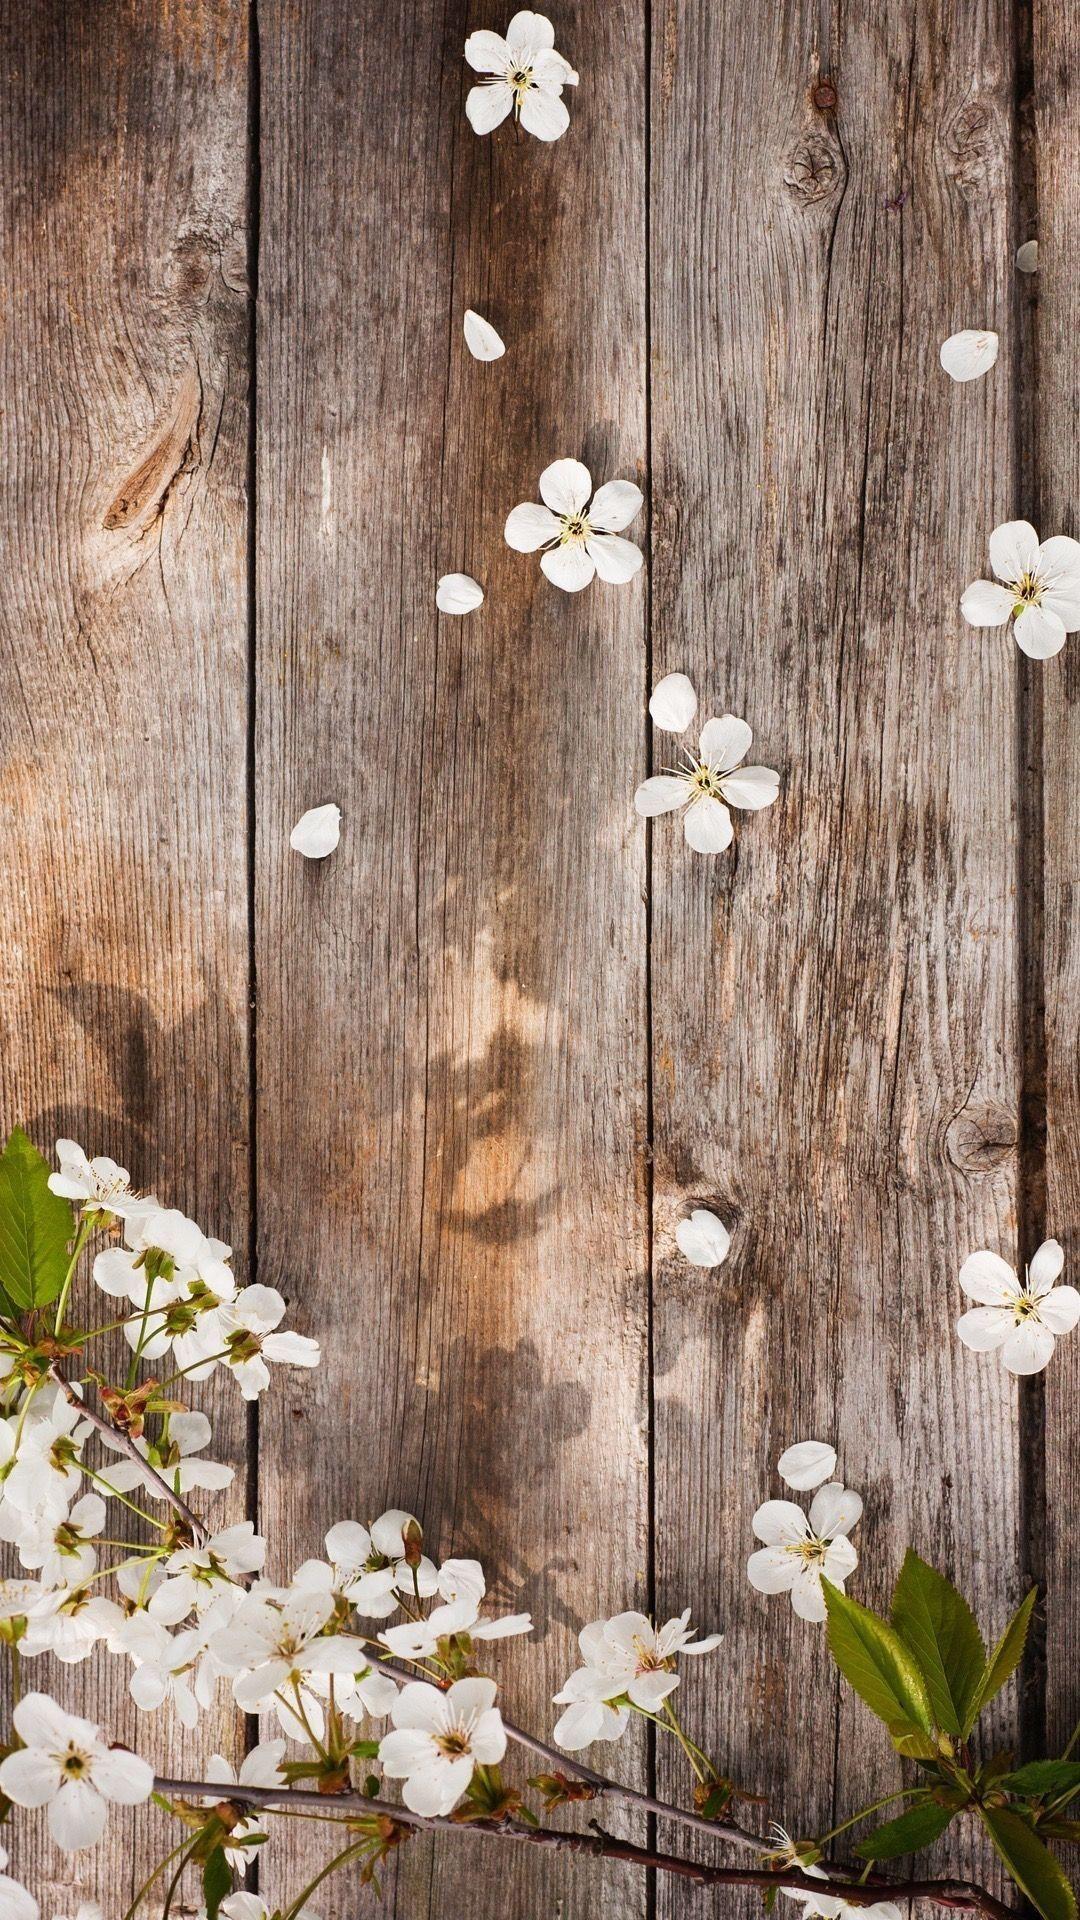 Rustic Flowers Phone Wallpapers Wallpaper Cave